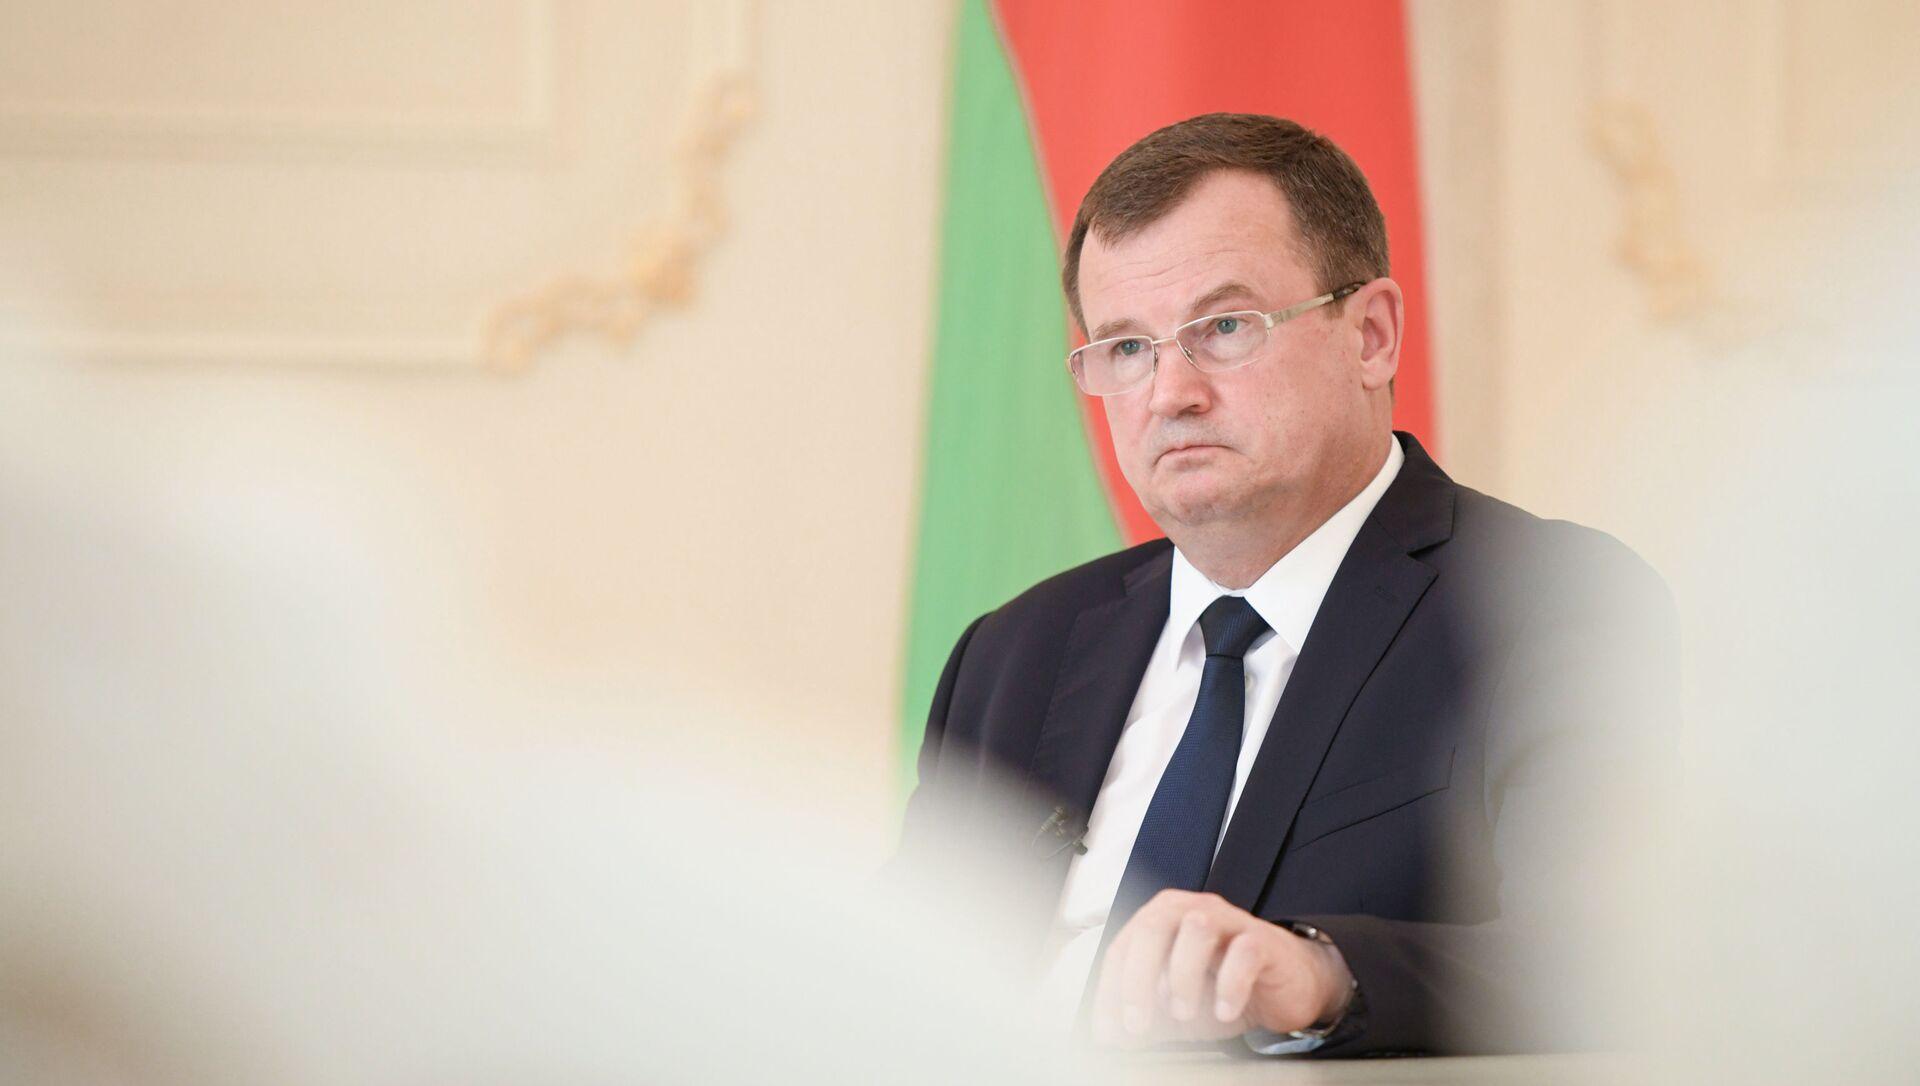 Посол Беларуси в Азербайджане Андрей Равков - Sputnik Азербайджан, 1920, 03.07.2021